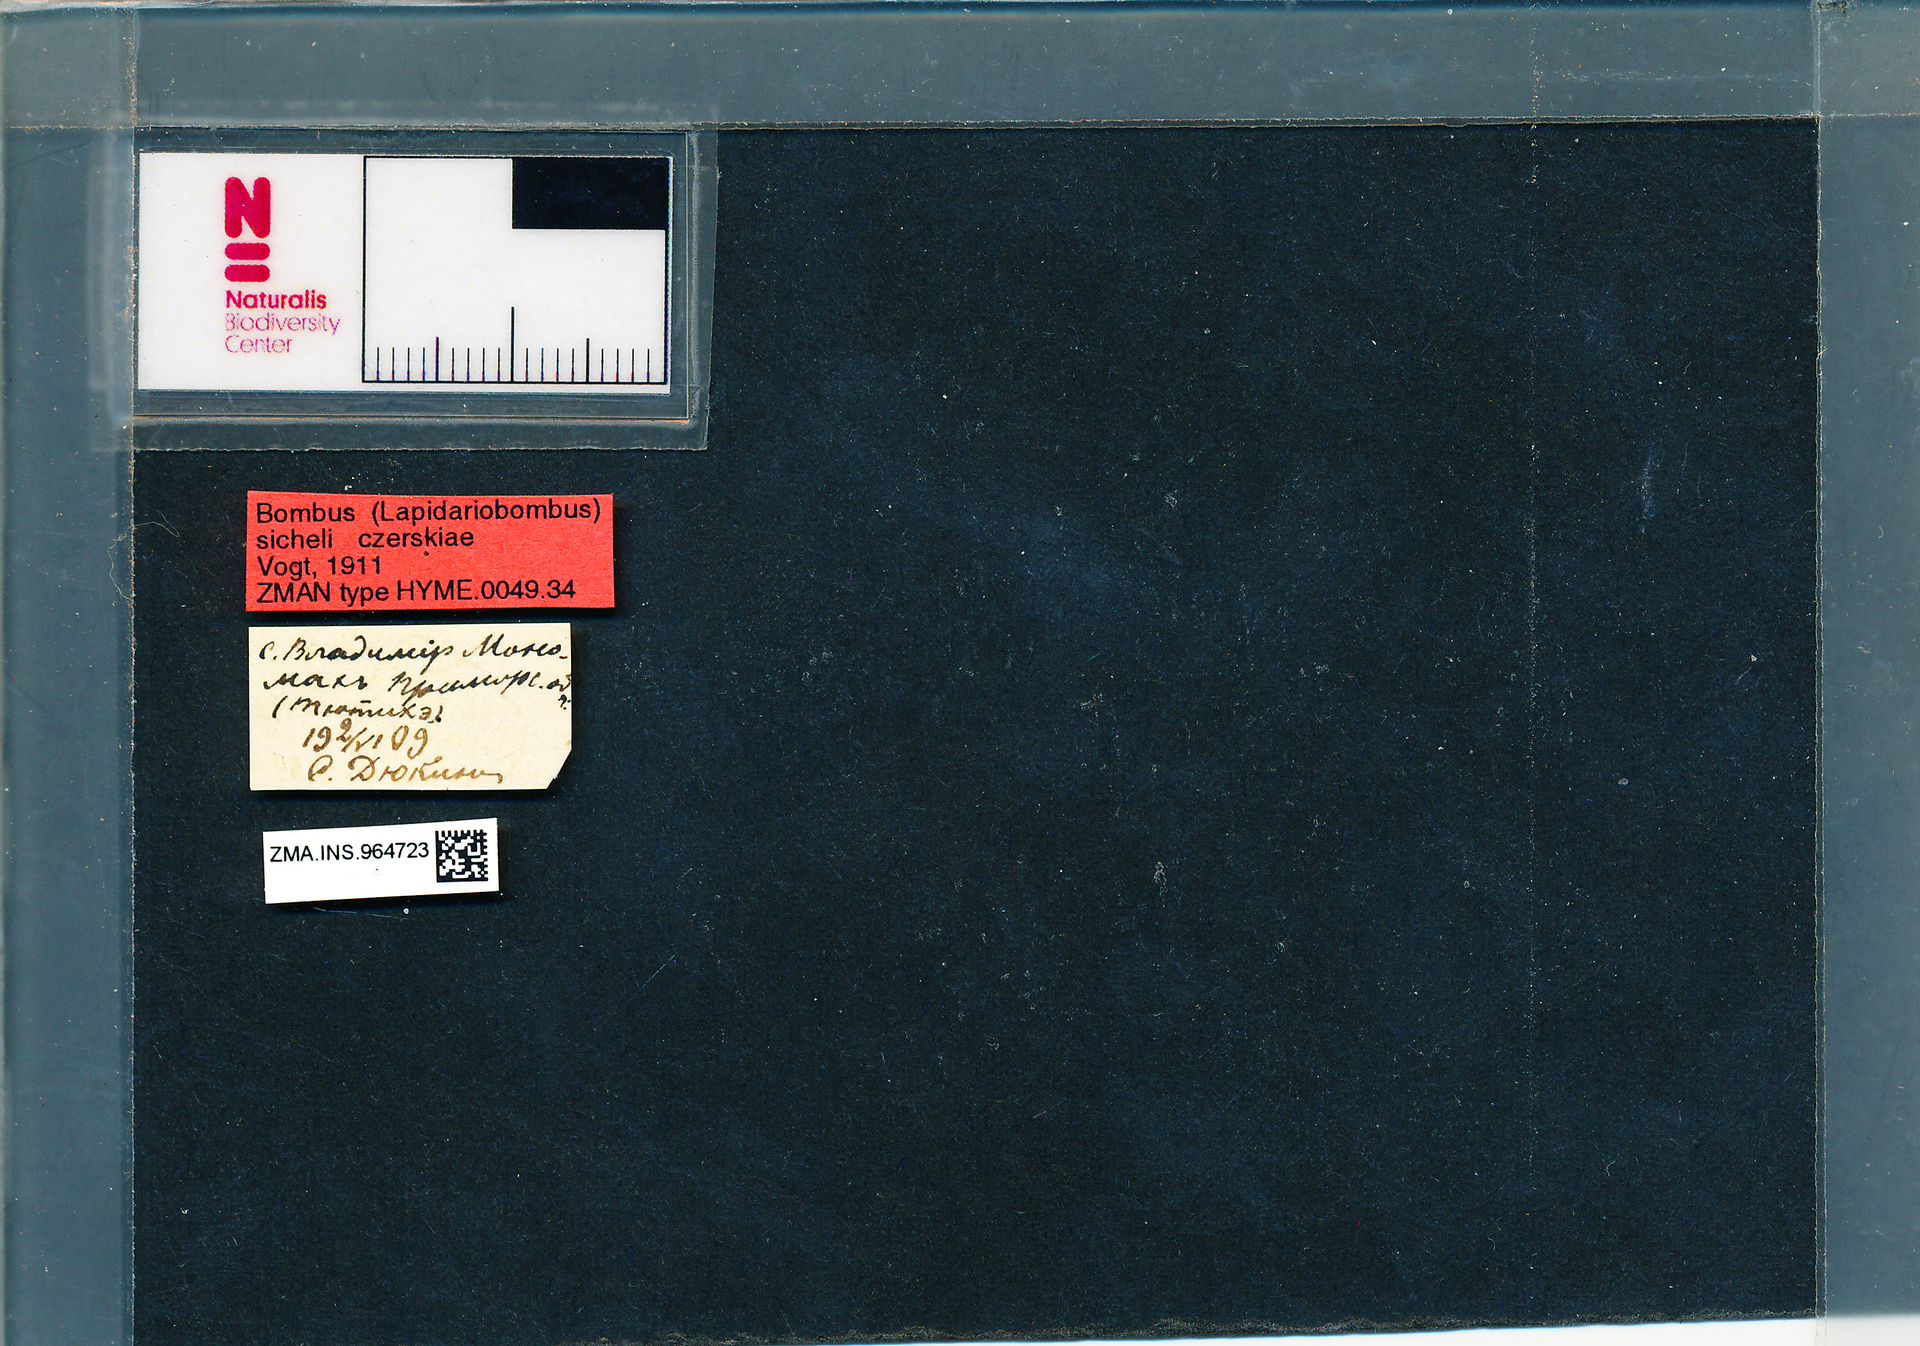 ZMA.INS.964723 | Bombus (Melanobombus) sichelii uniens Vogt, 1911